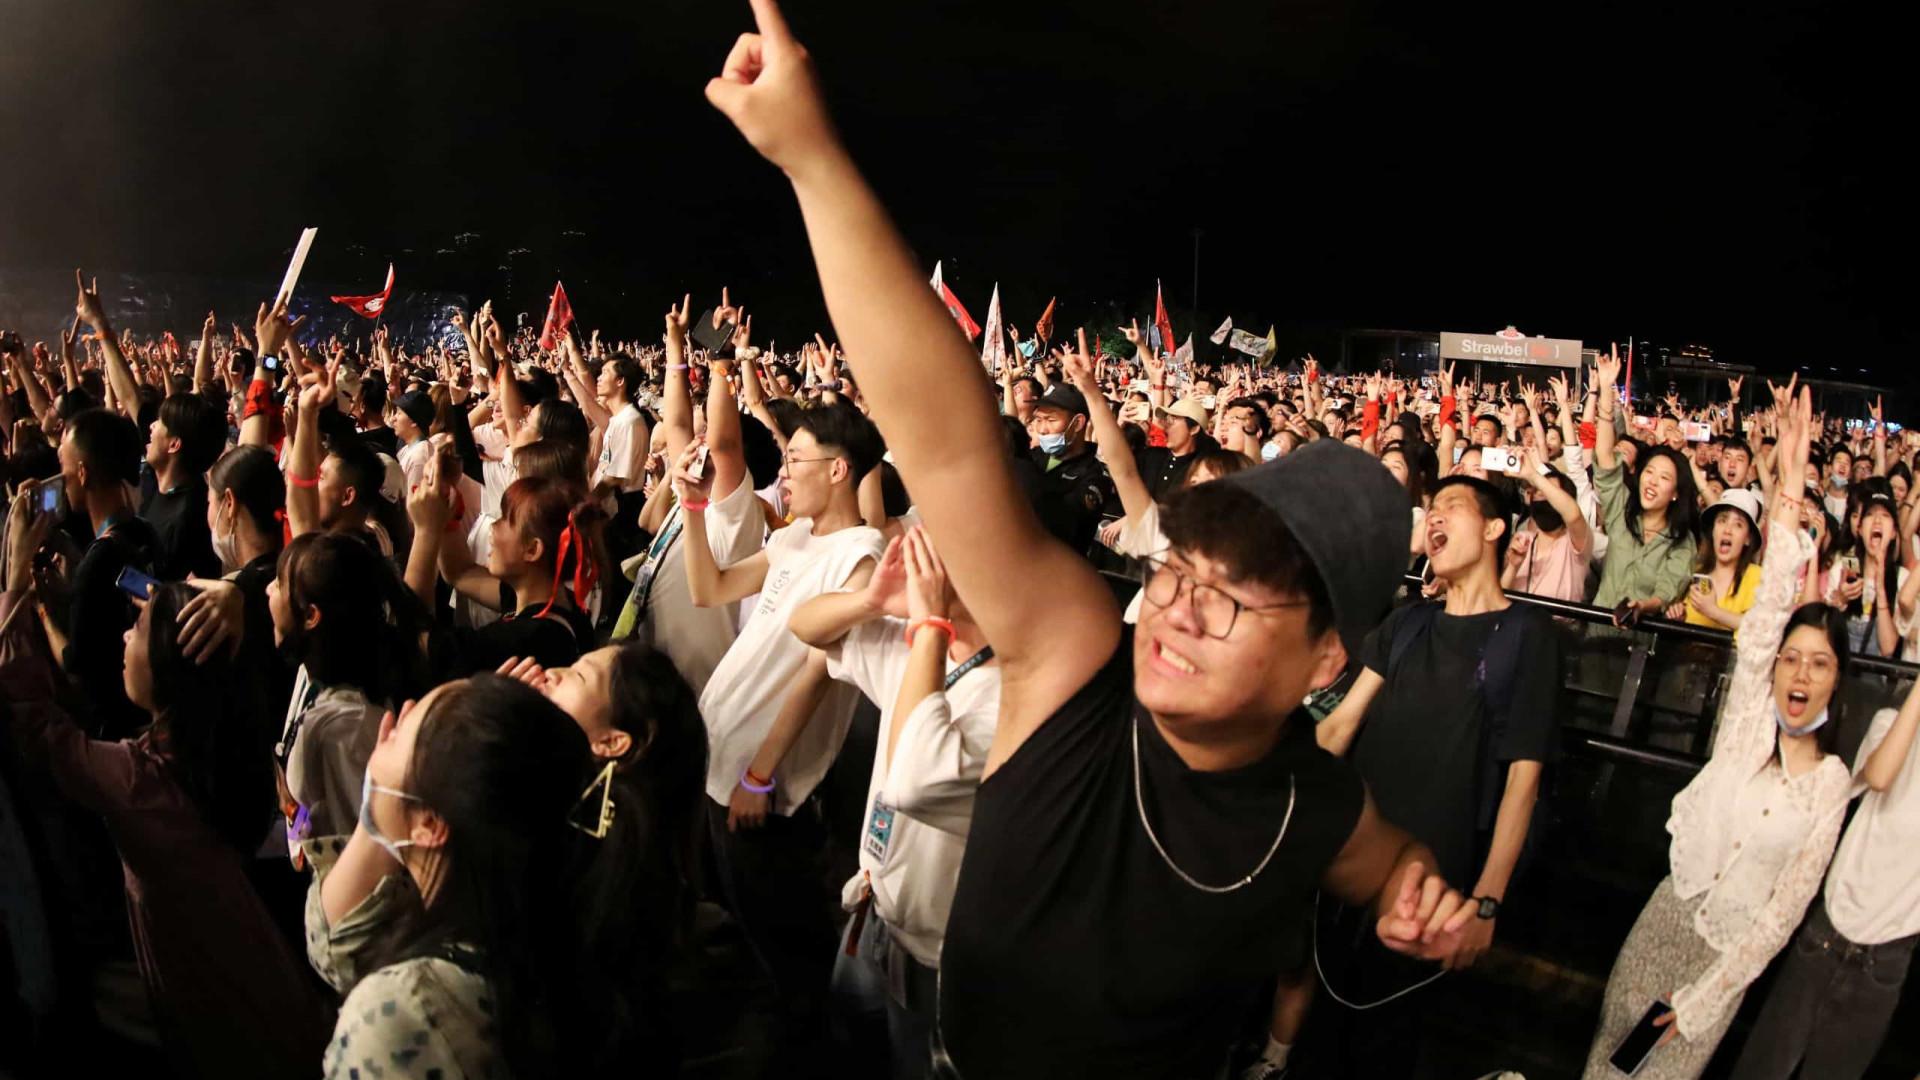 Com ou sem máscara, Wuhan volta a ser palco de festival que juntou 11 mil